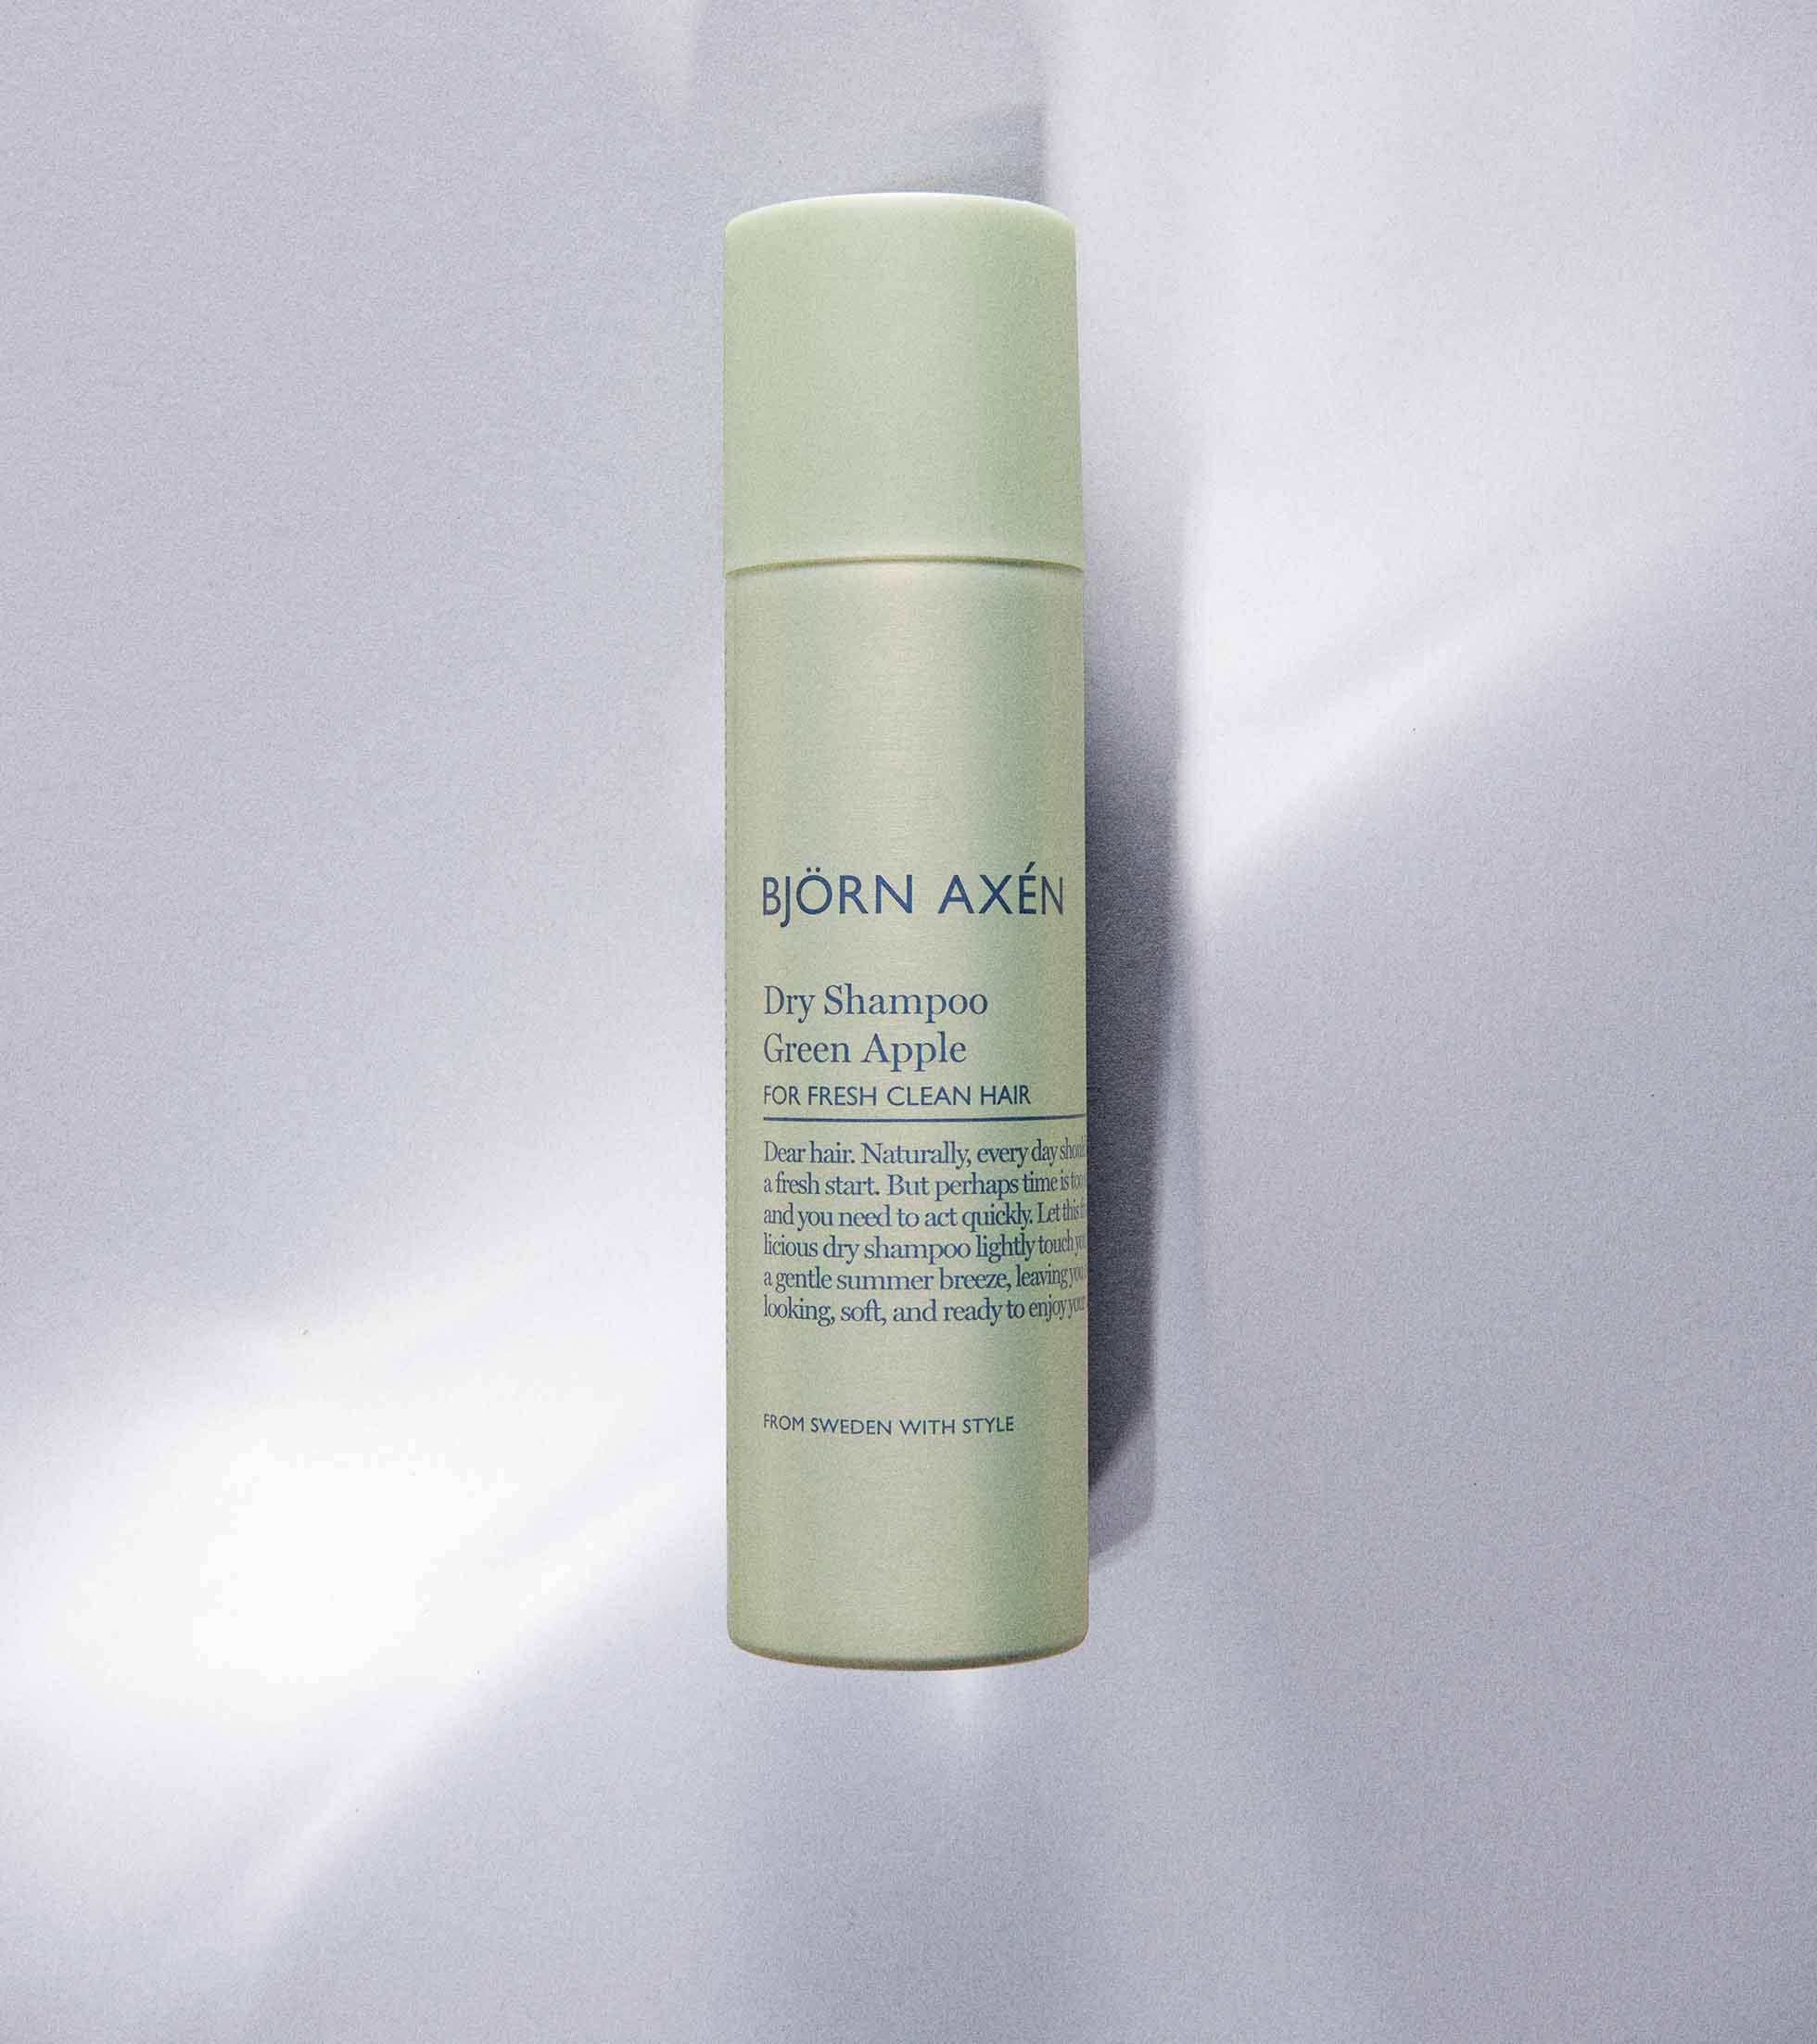 Dry Shampoo Green Apple